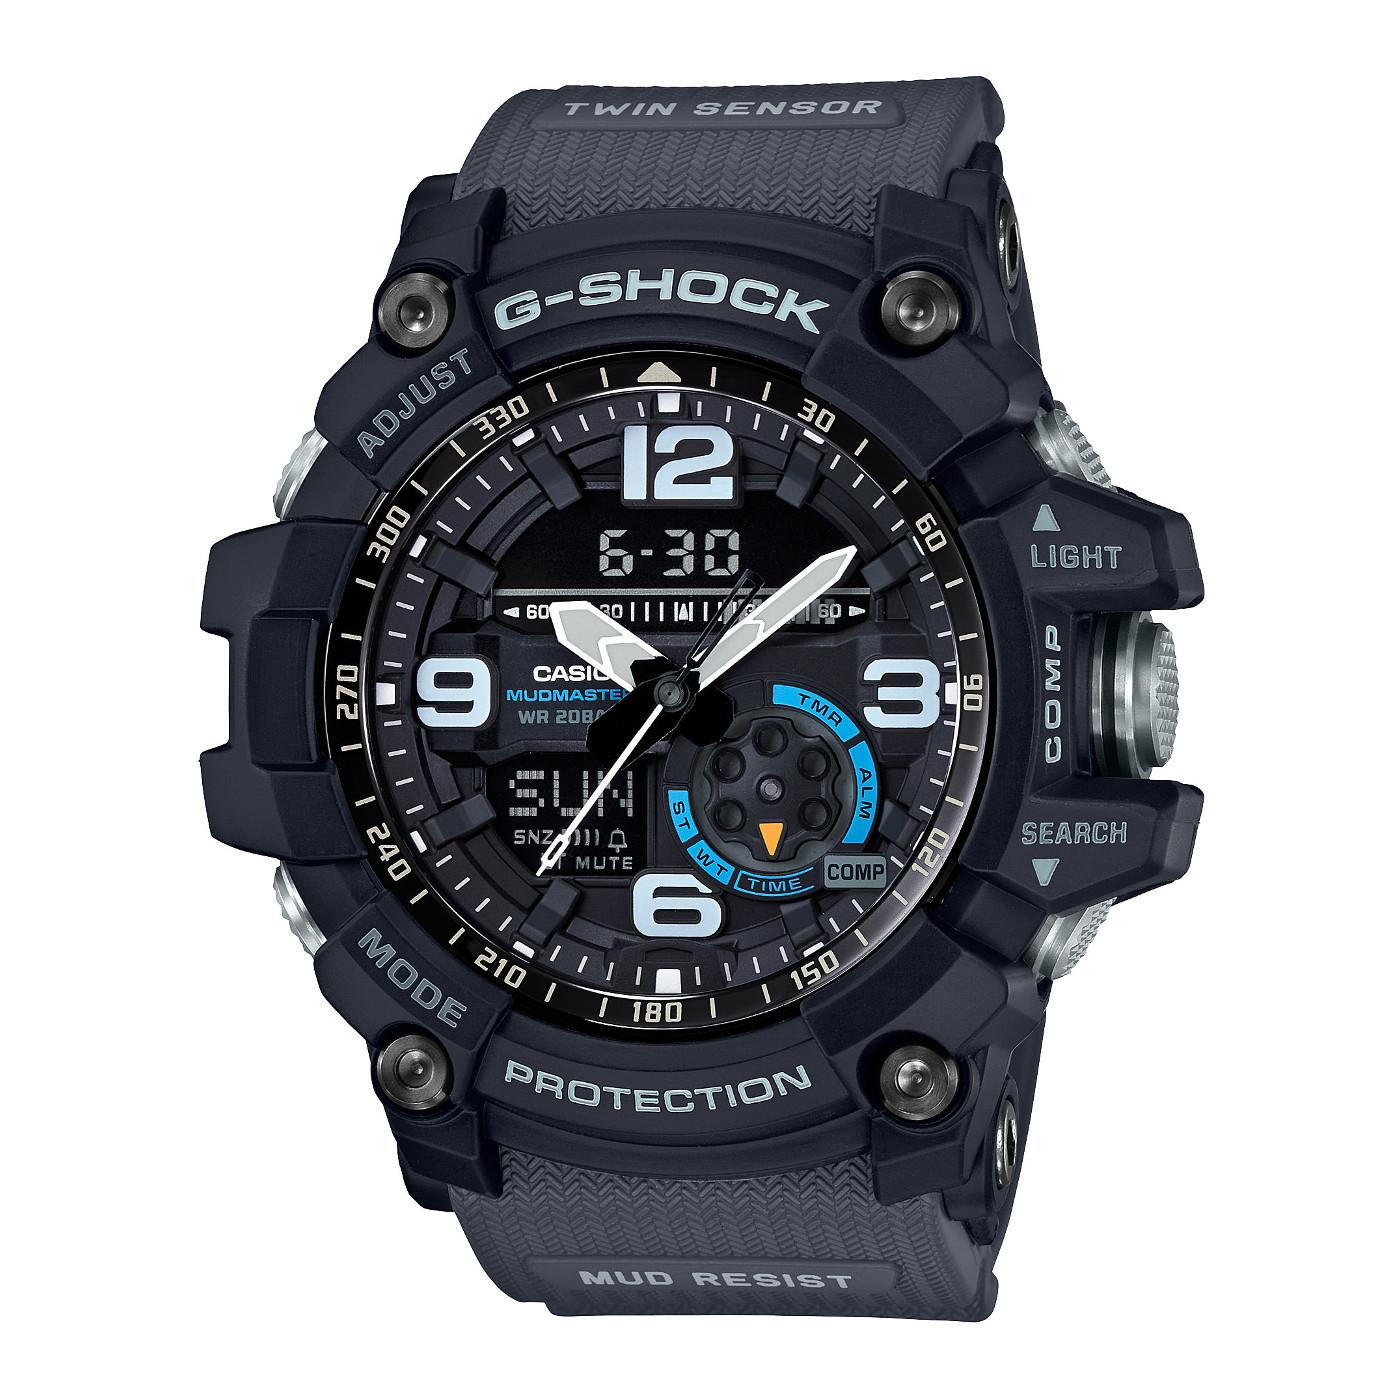 G-Shock Mudmaster horloge GG-1000-1A8ER